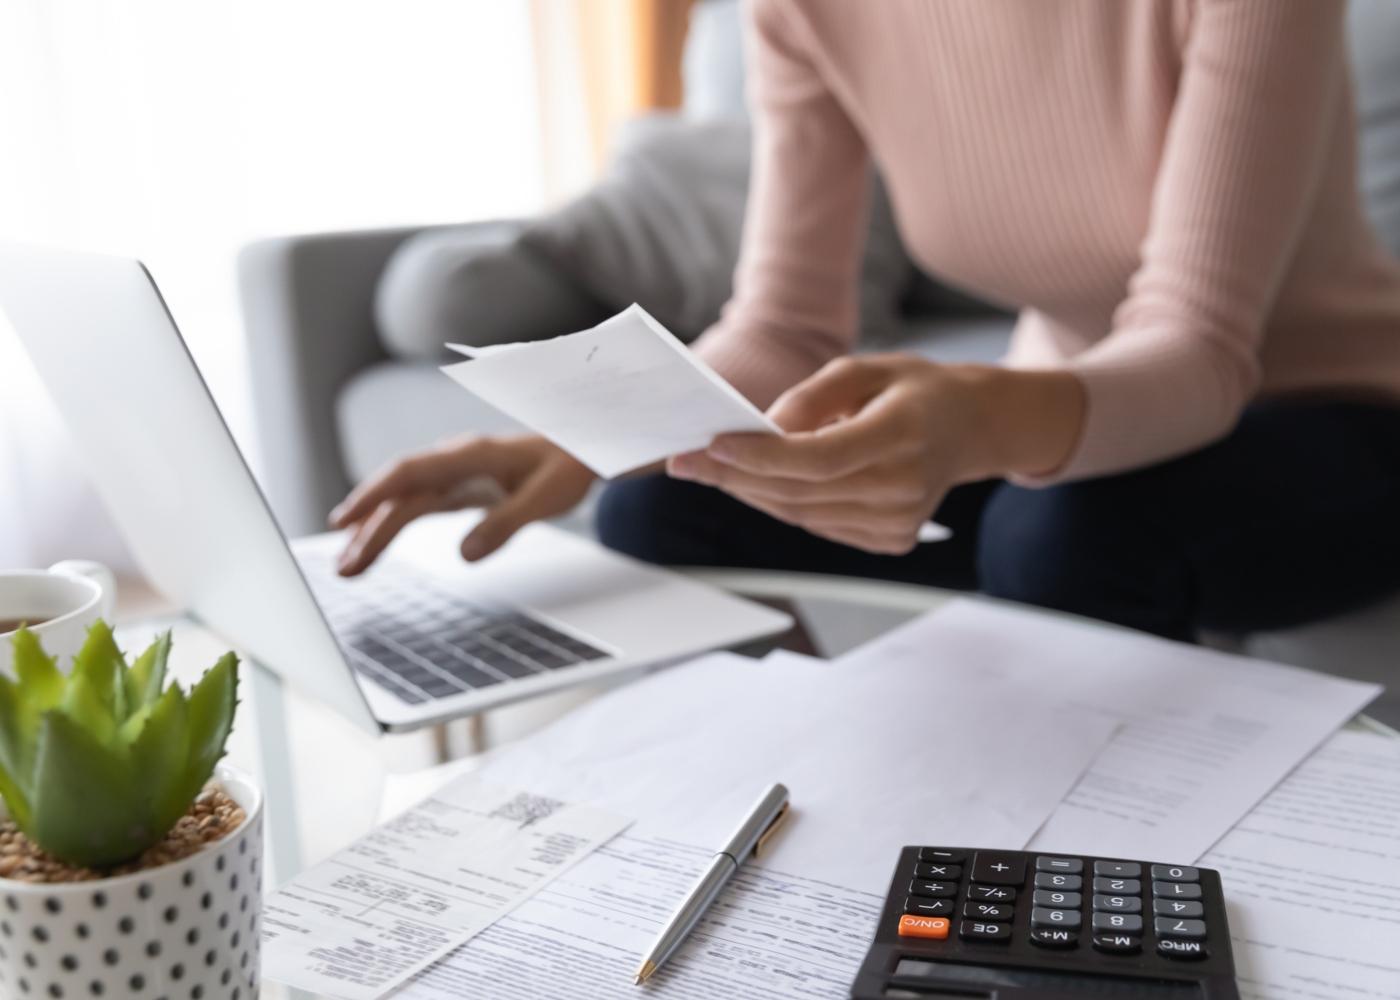 Mulher a calcular despesas domésticas